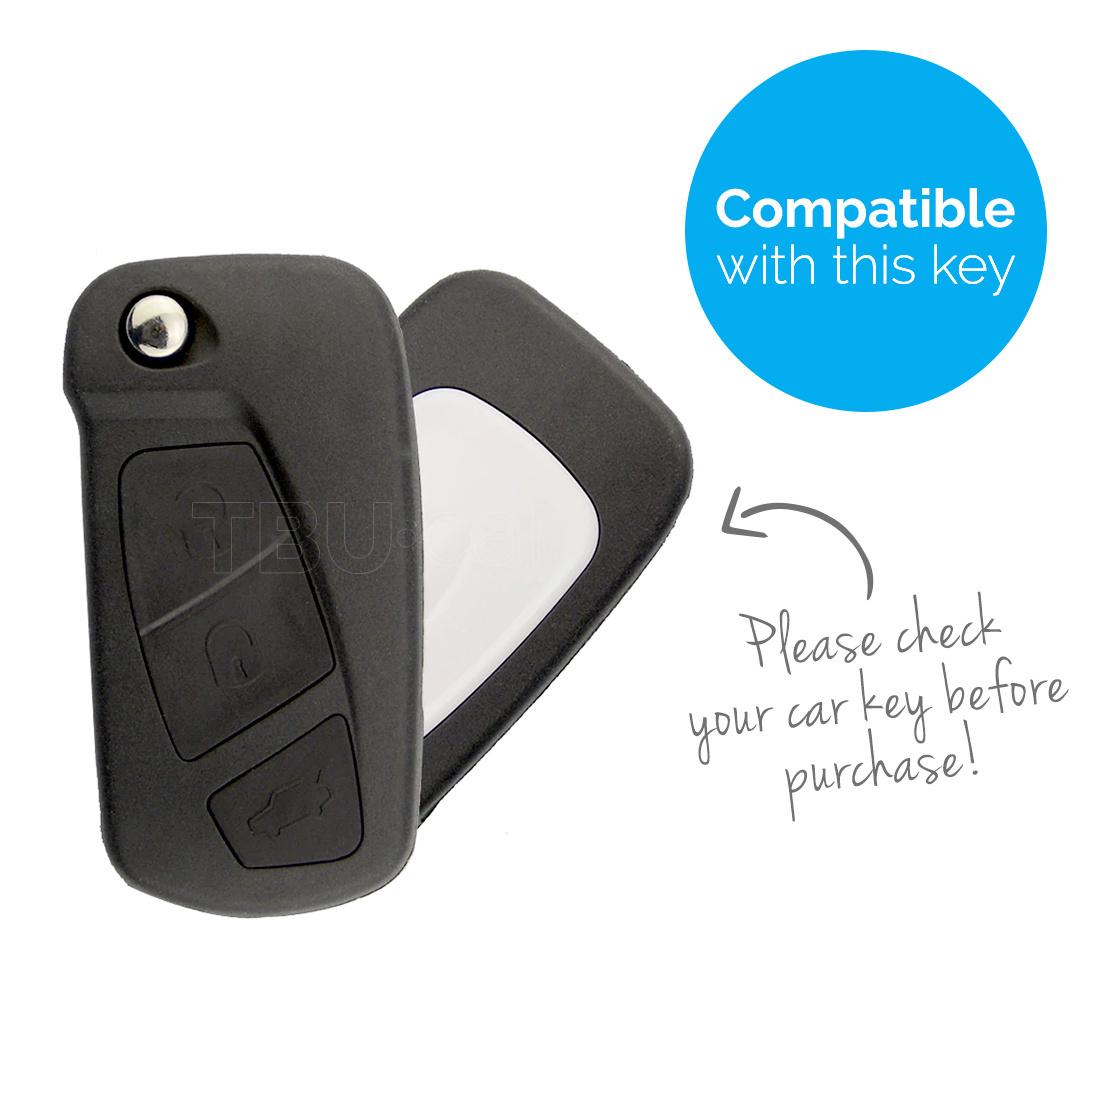 TBU car TBU car Autoschlüssel Hülle kompatibel mit Ford 3 Tasten (KA) - Schutzhülle aus Silikon - Auto Schlüsselhülle Cover in Schwarz